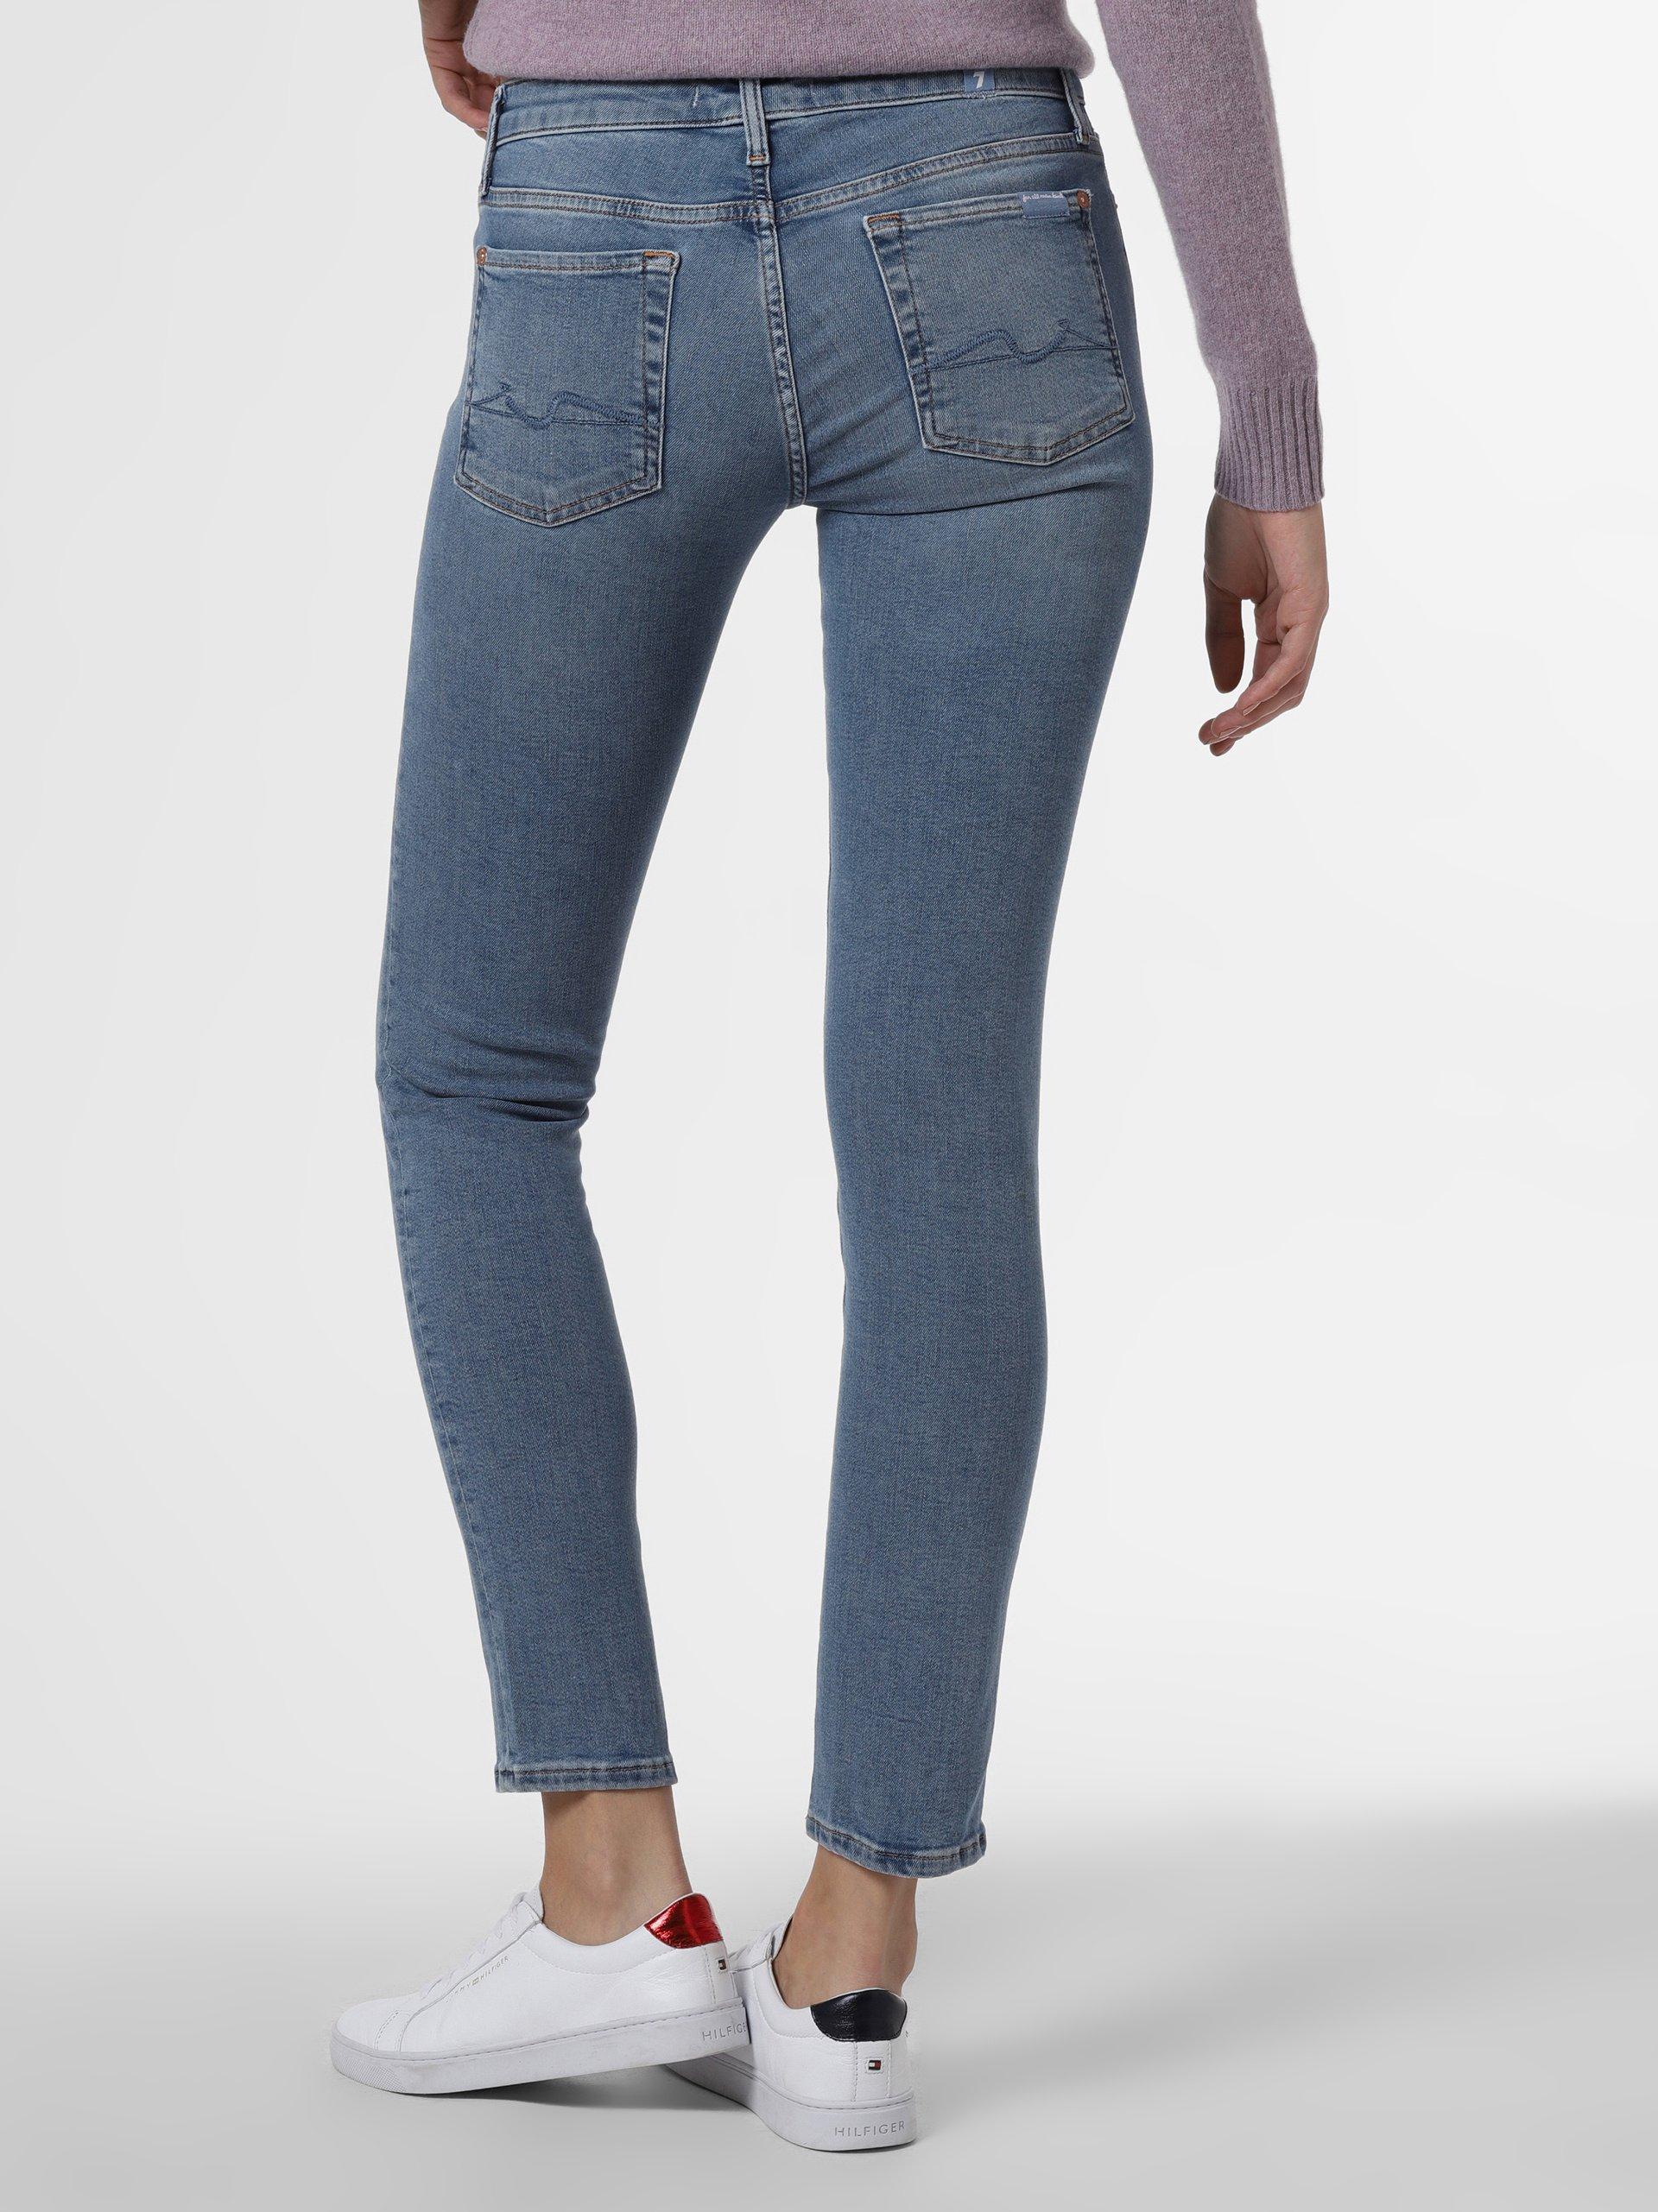 7 For All Mankind Damen Jeans - Pyper